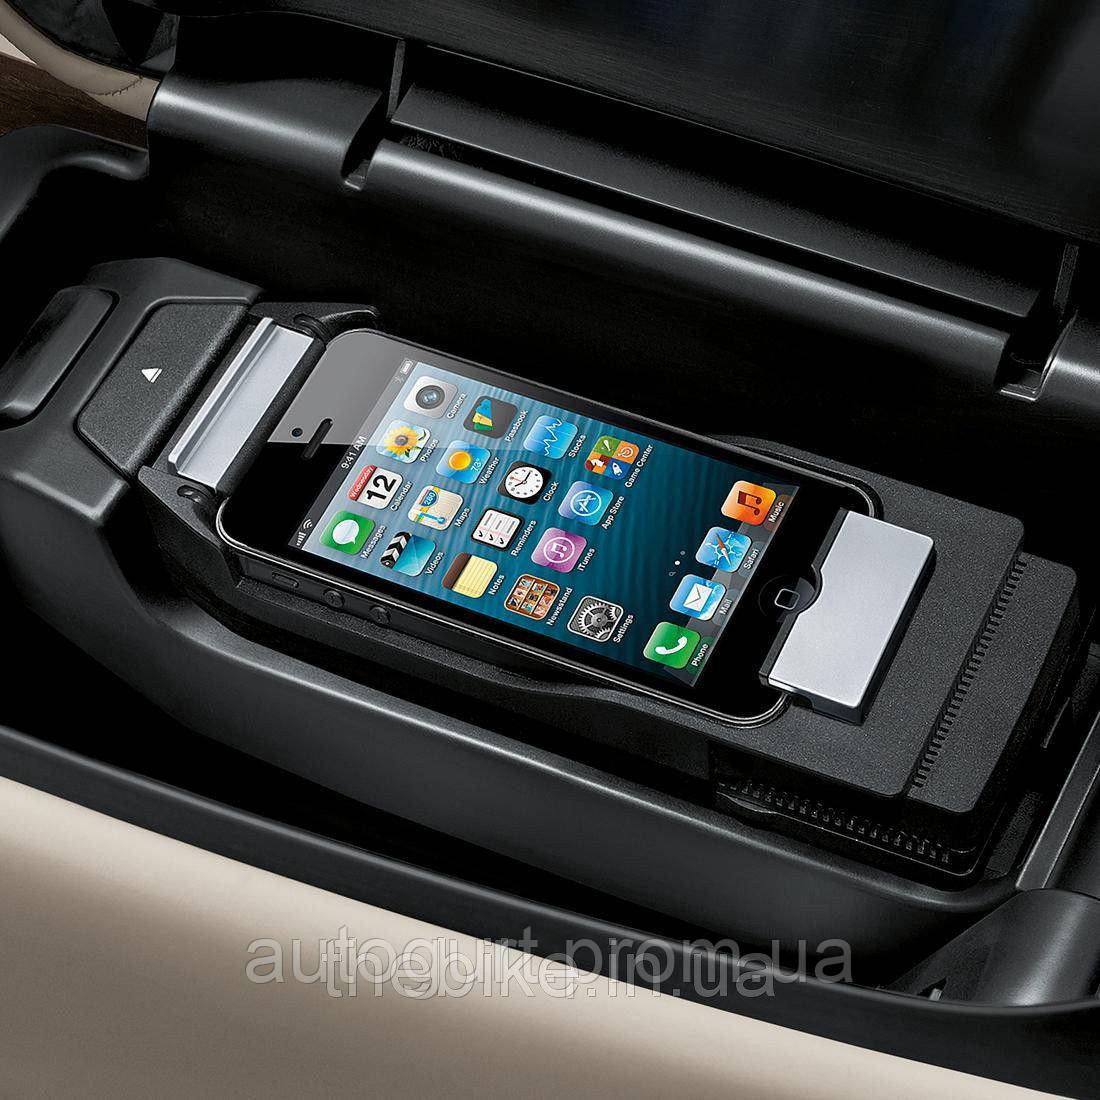 Адаптер BMW Snap-in для iPhone 6/6S